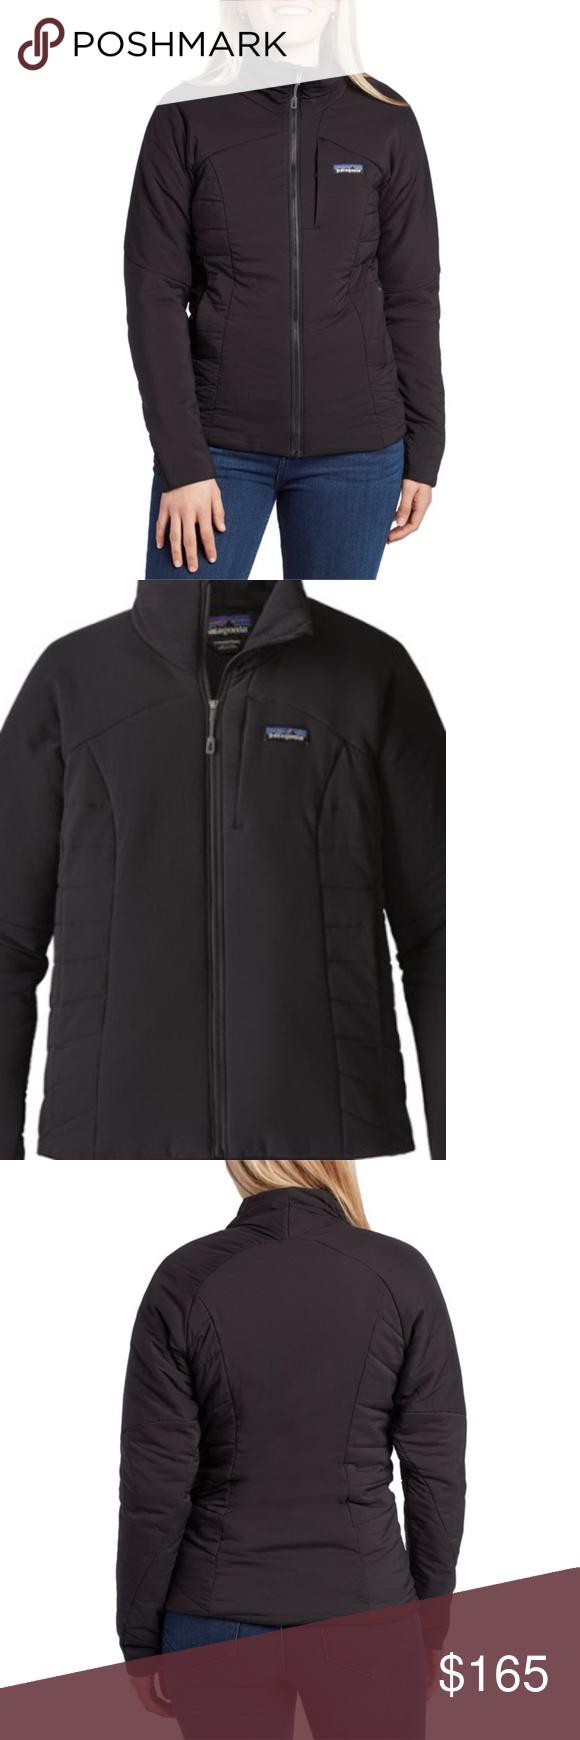 NWT Patagonia Nano Air Jacket Womens XL NWT Jackets for